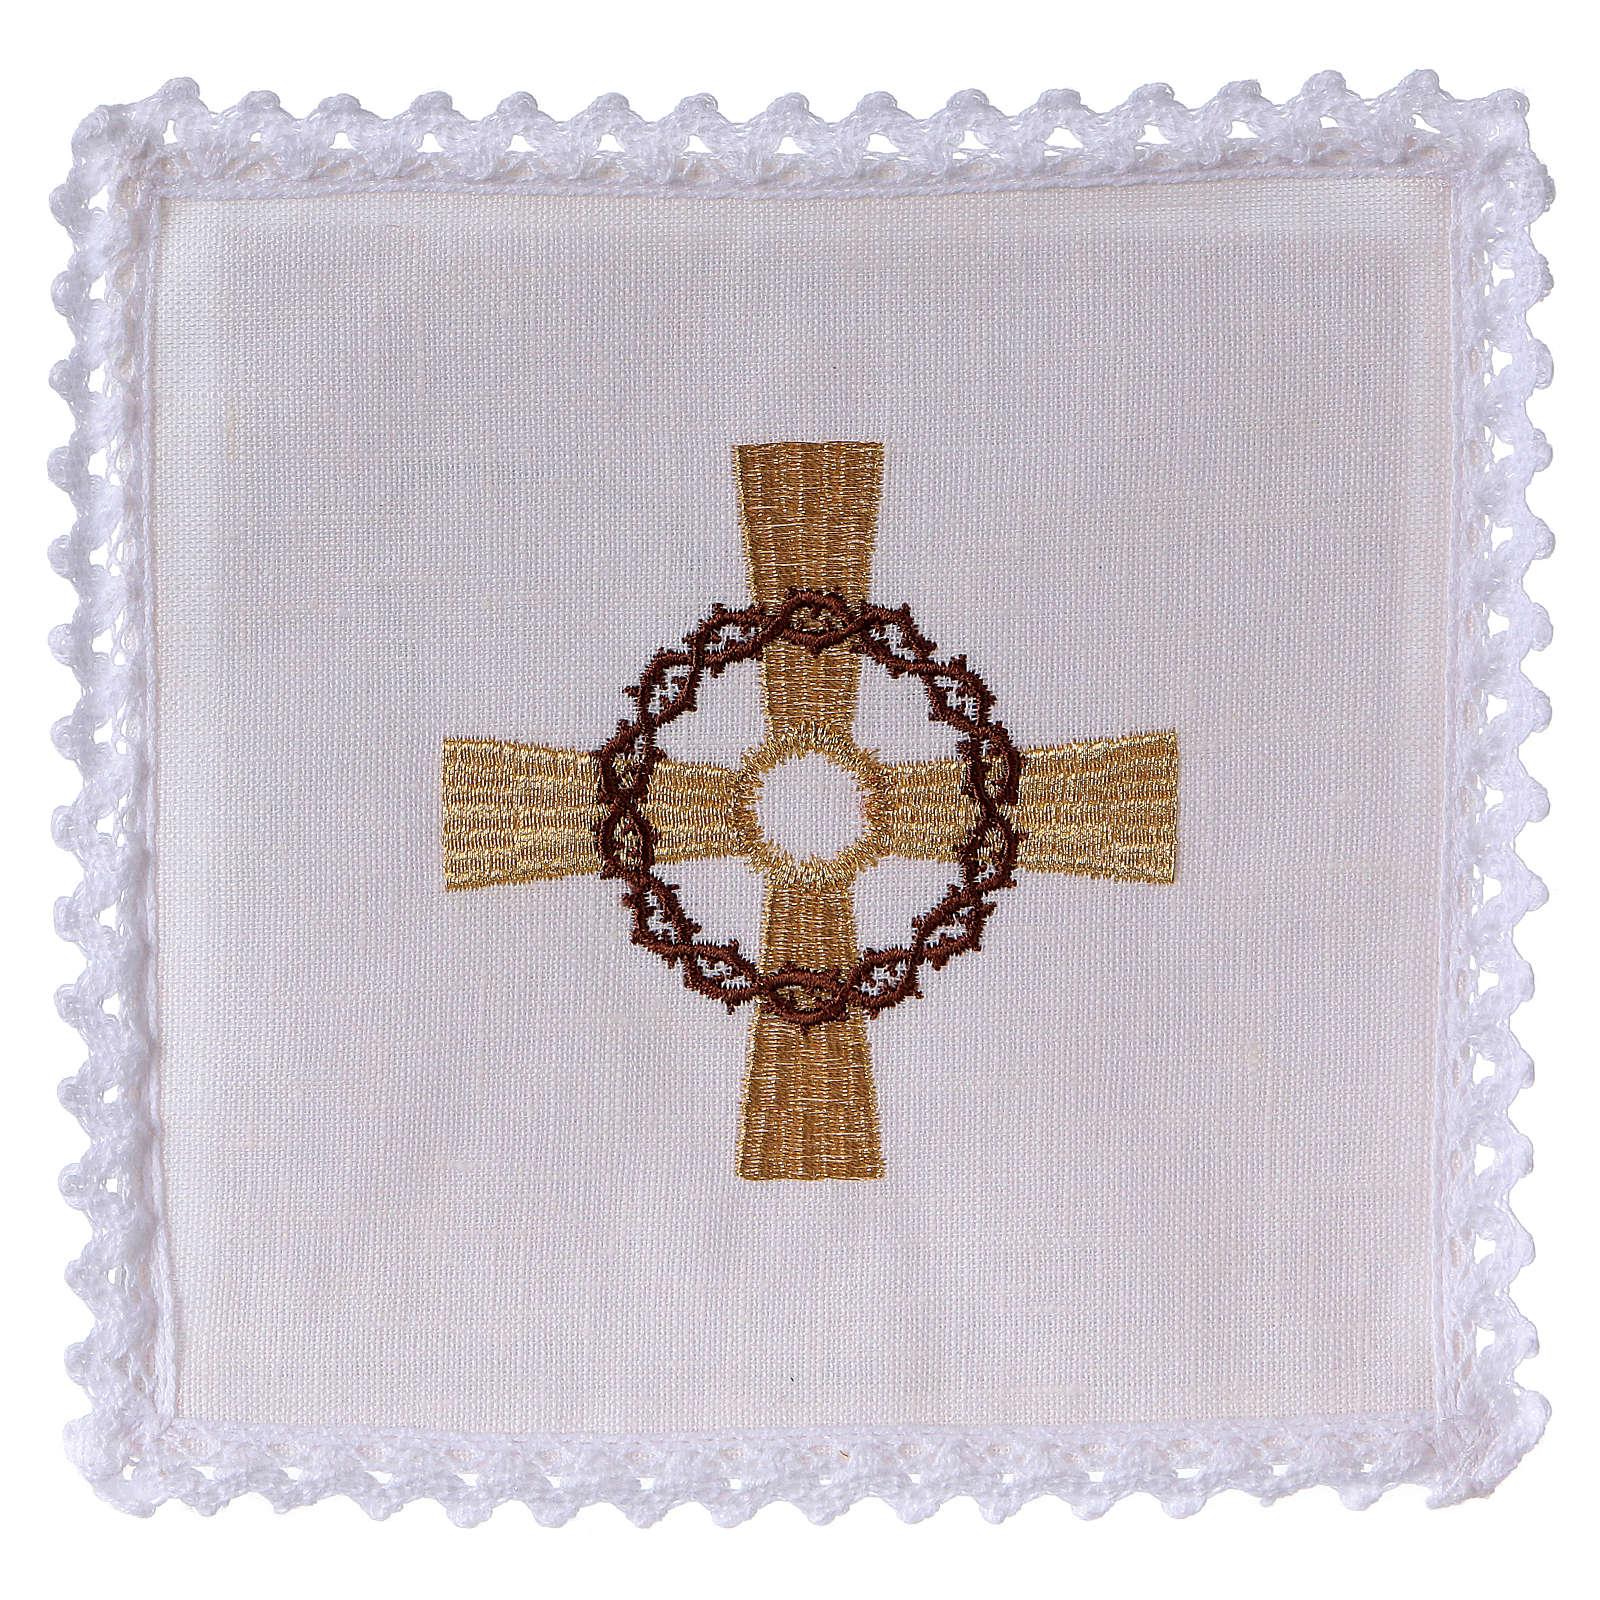 Servicio de altar hilo cruz dorada corona de espinas 4